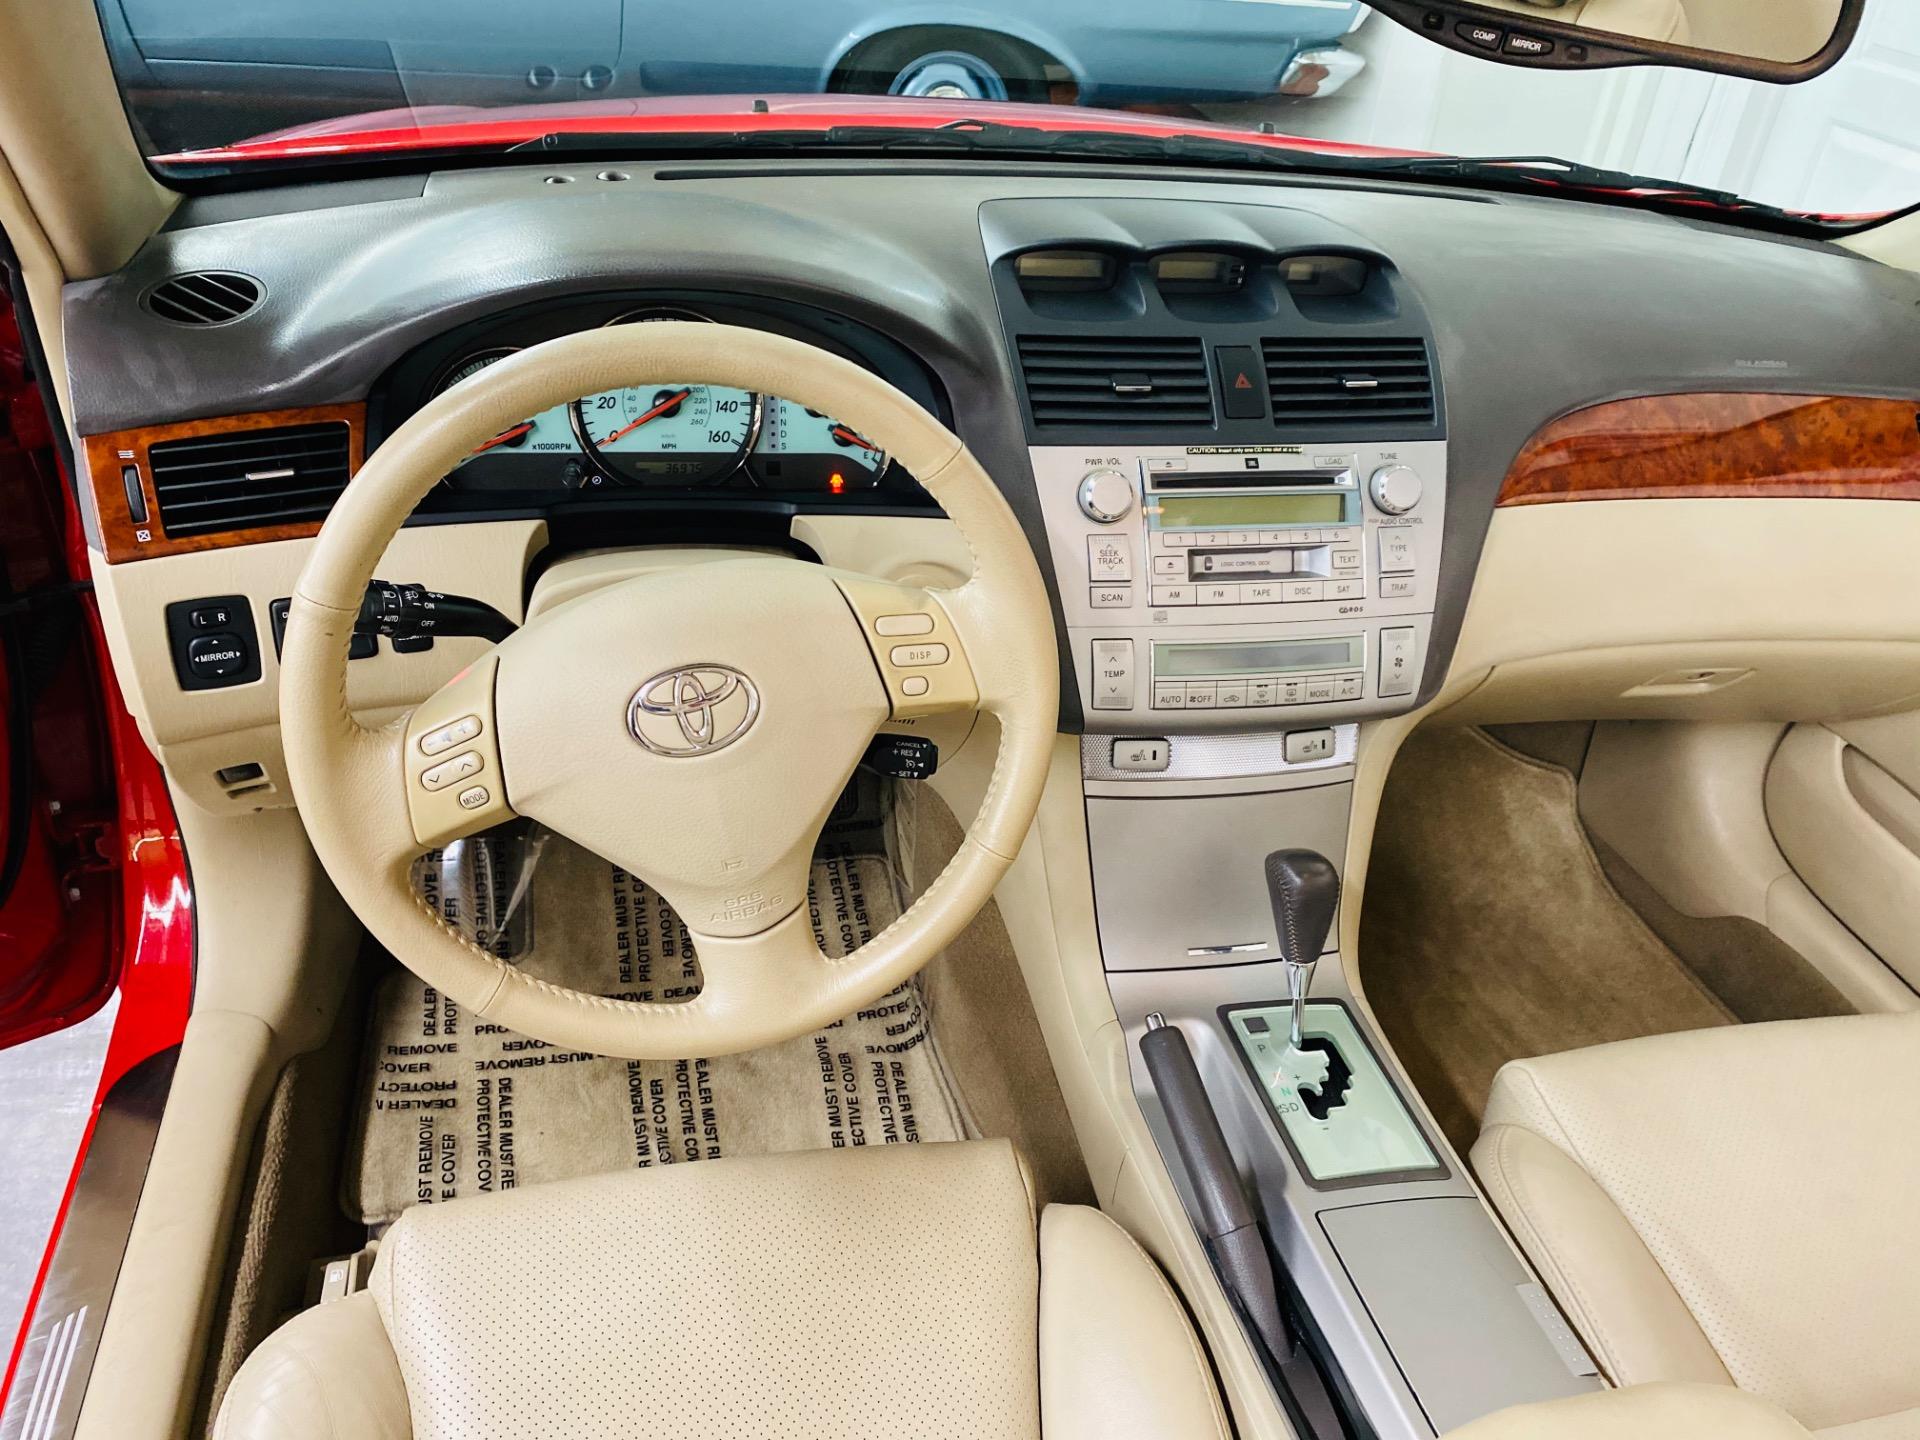 Used 2006 Toyota Camry Solara - CONVERTIBLE - SLE V6 - LOW MILES - | Mundelein, IL